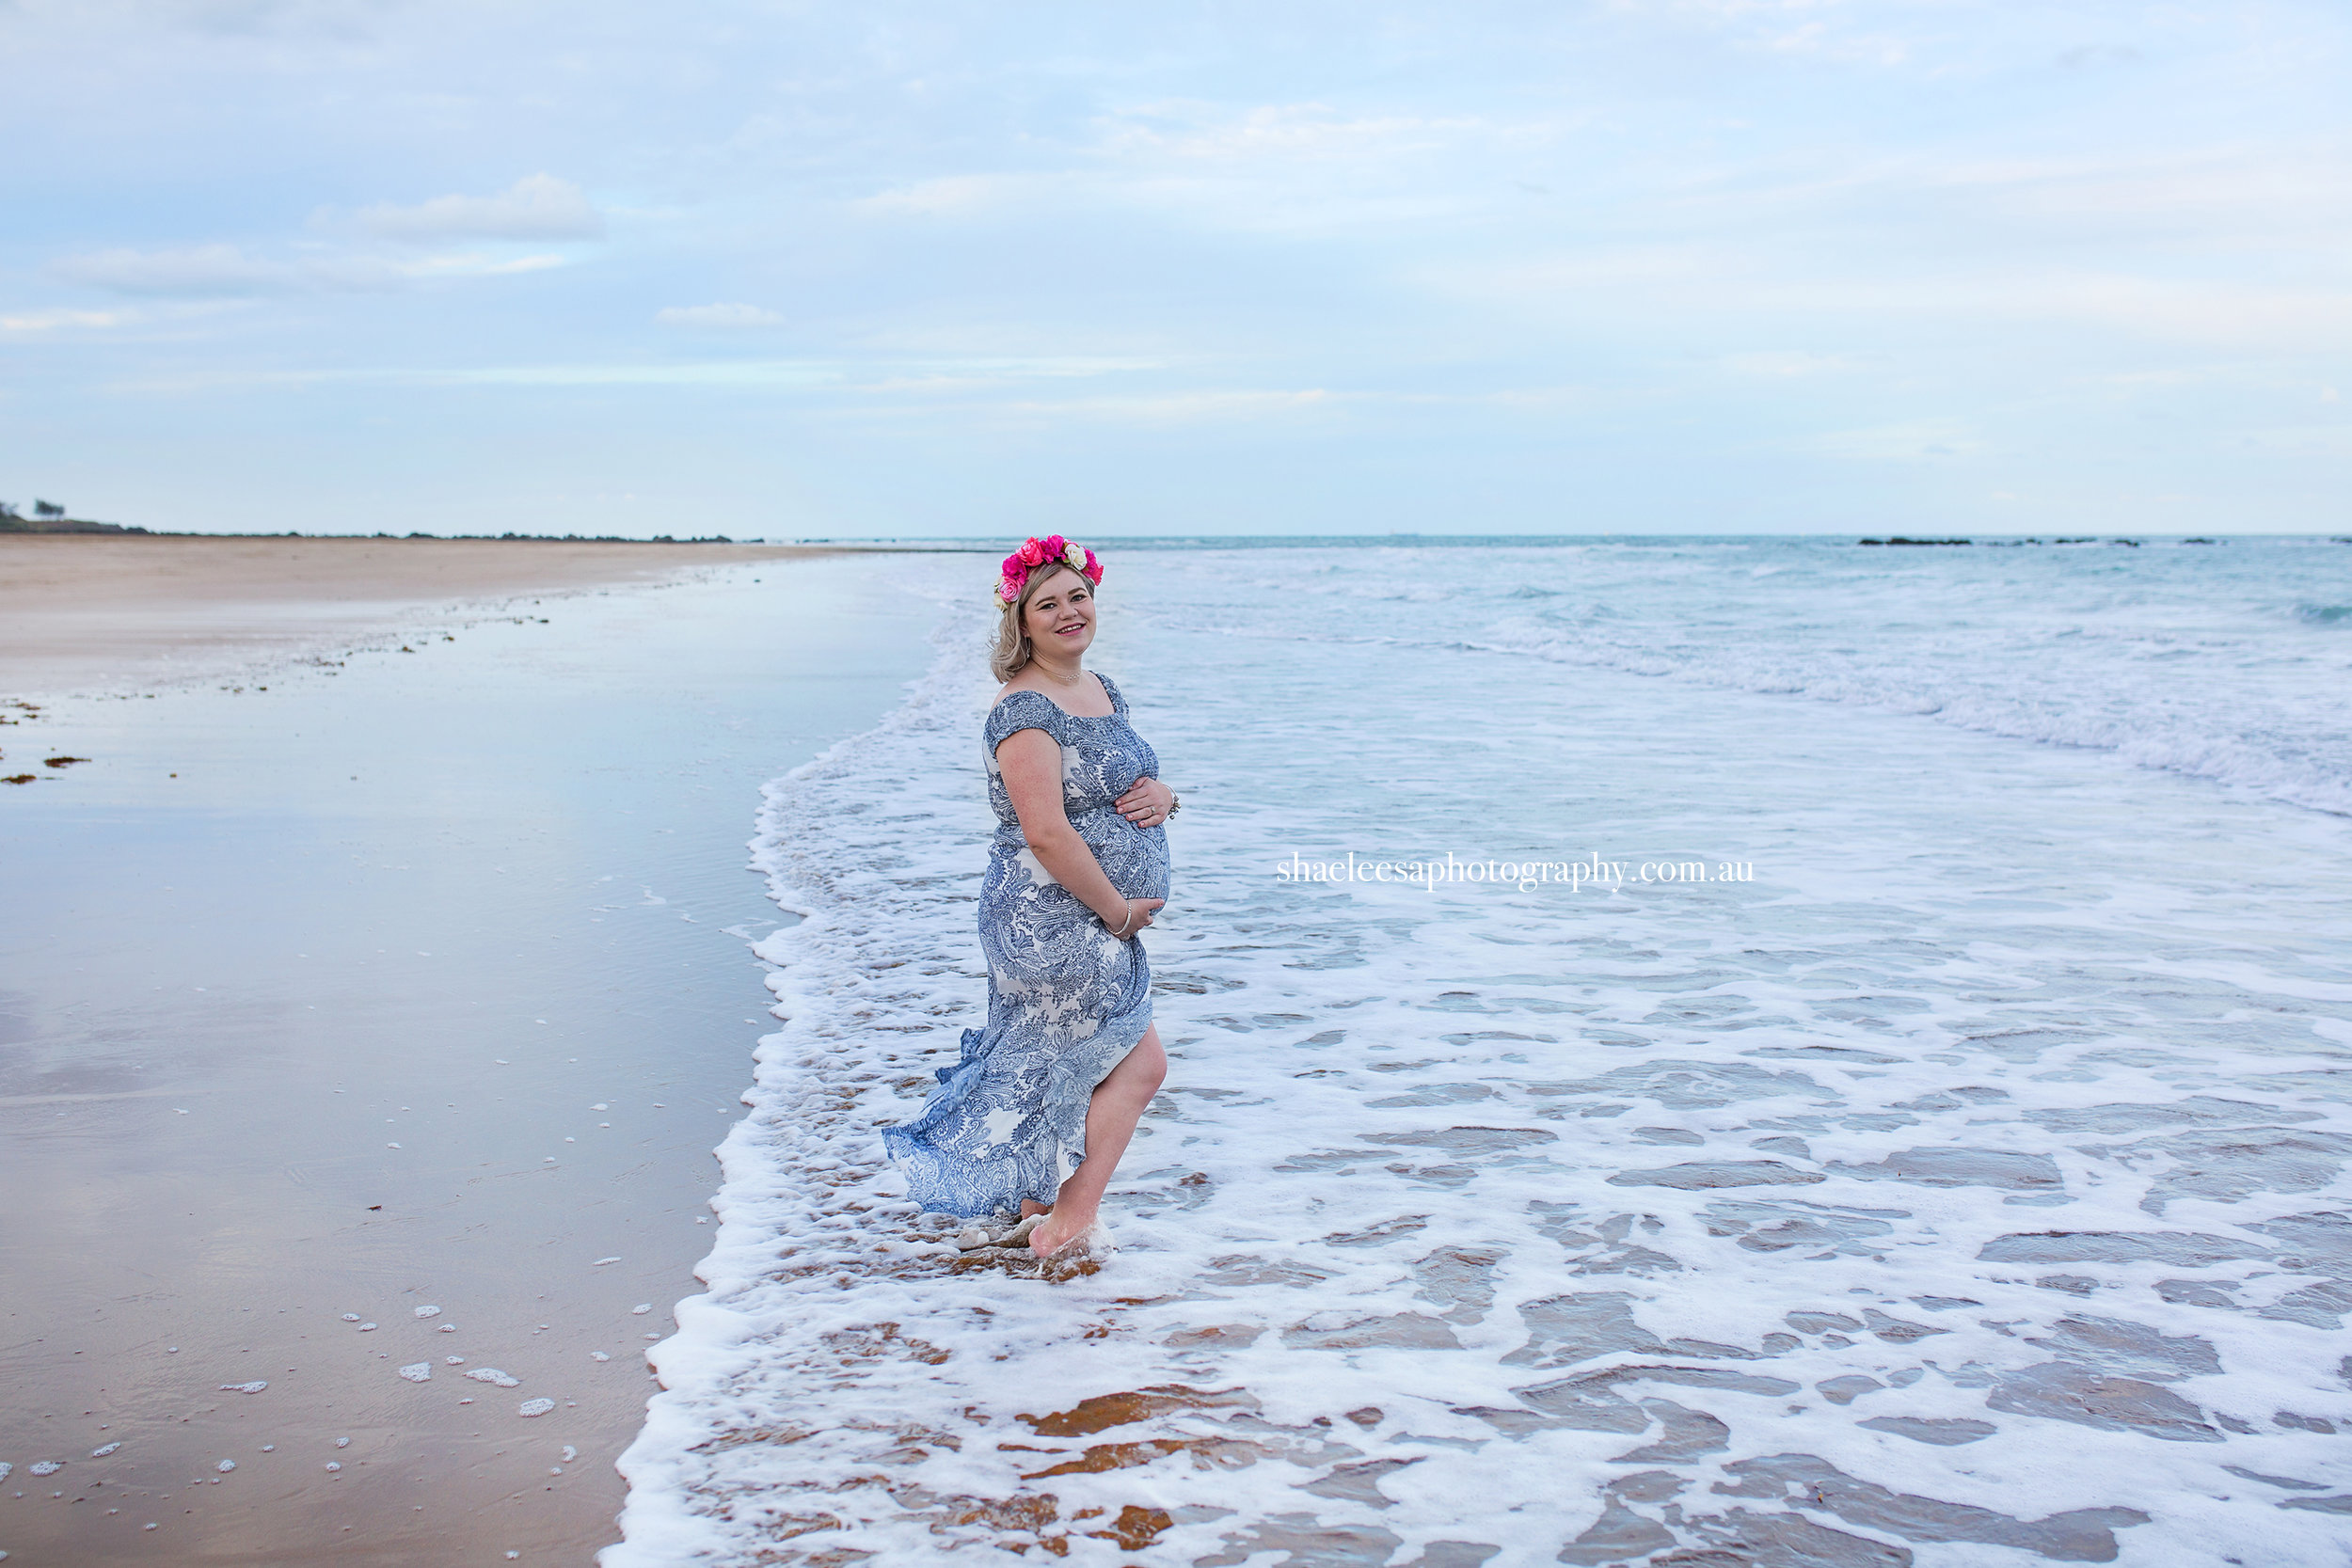 ShaeLeesaPhotography_062_Kumar_Maternity.jpg